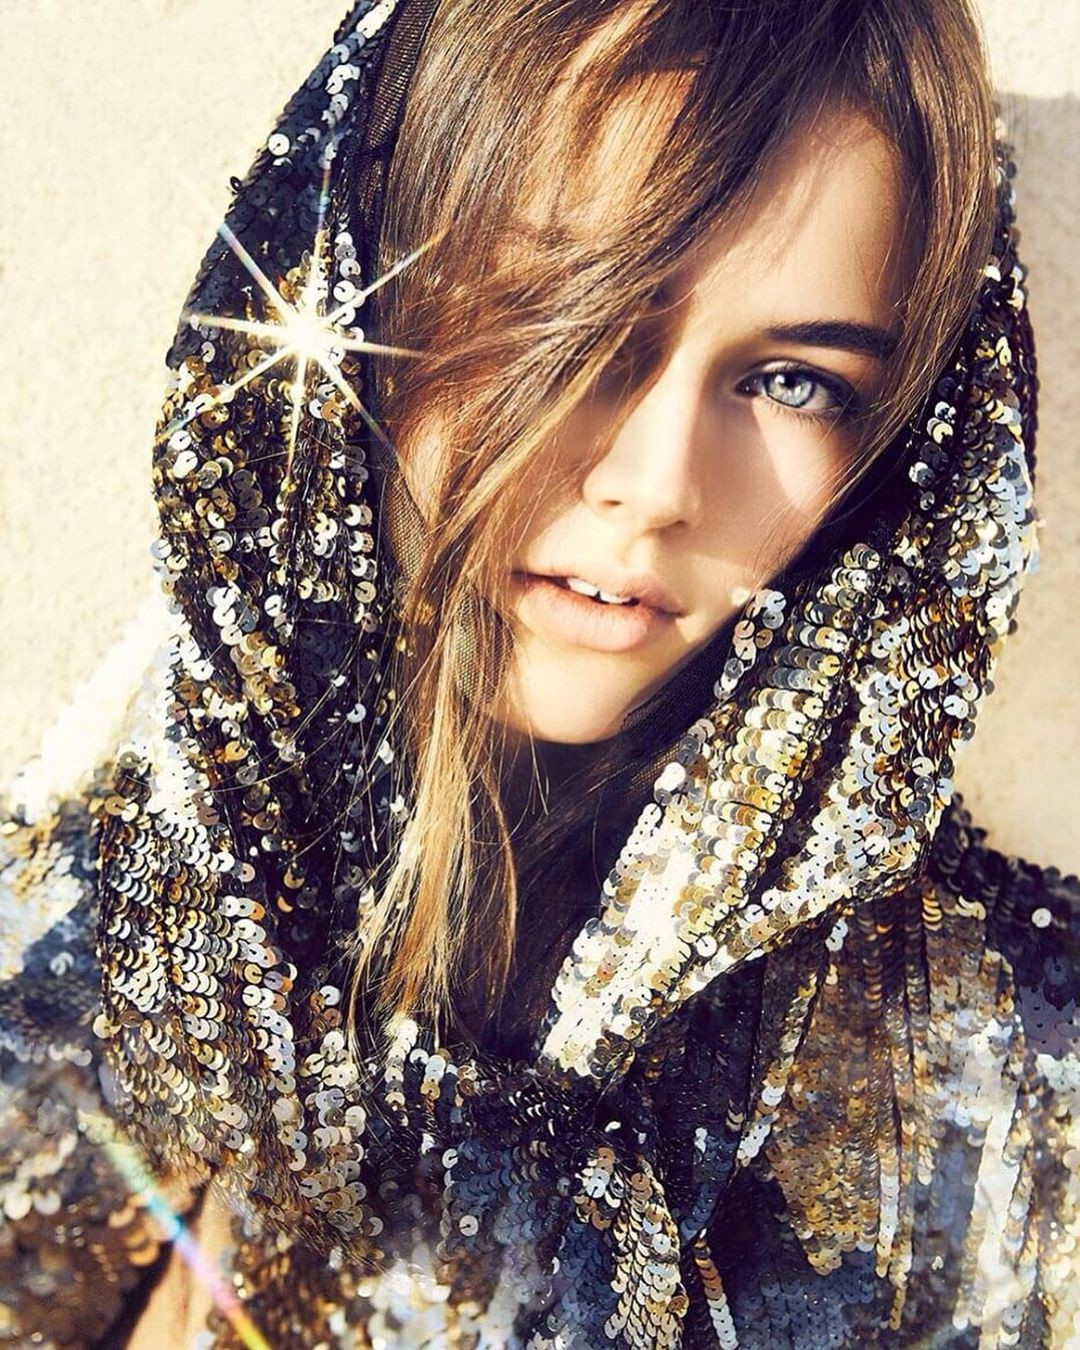 Kristina Pimenova instagram photoshoot, Face Makeup, Lips Smile